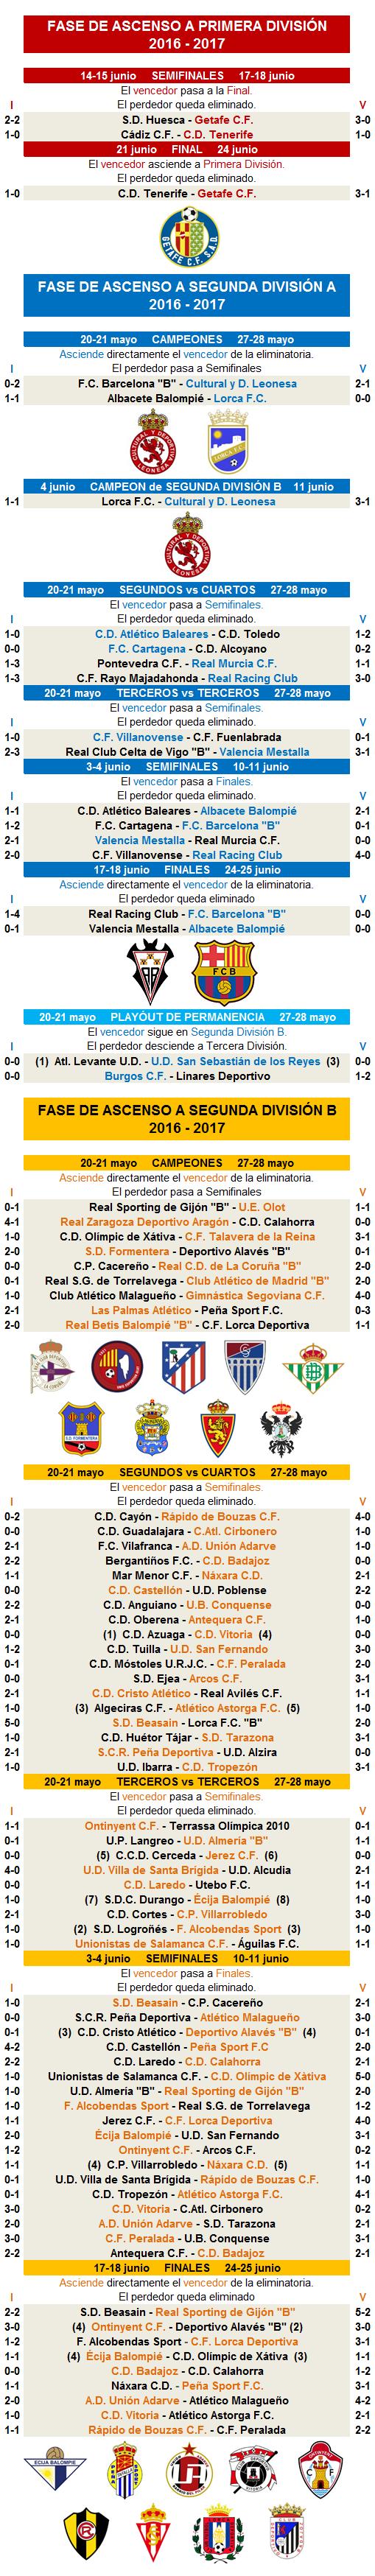 Promocion ascenso Segunda A Segunda B 2016-2017 jornada 6 final